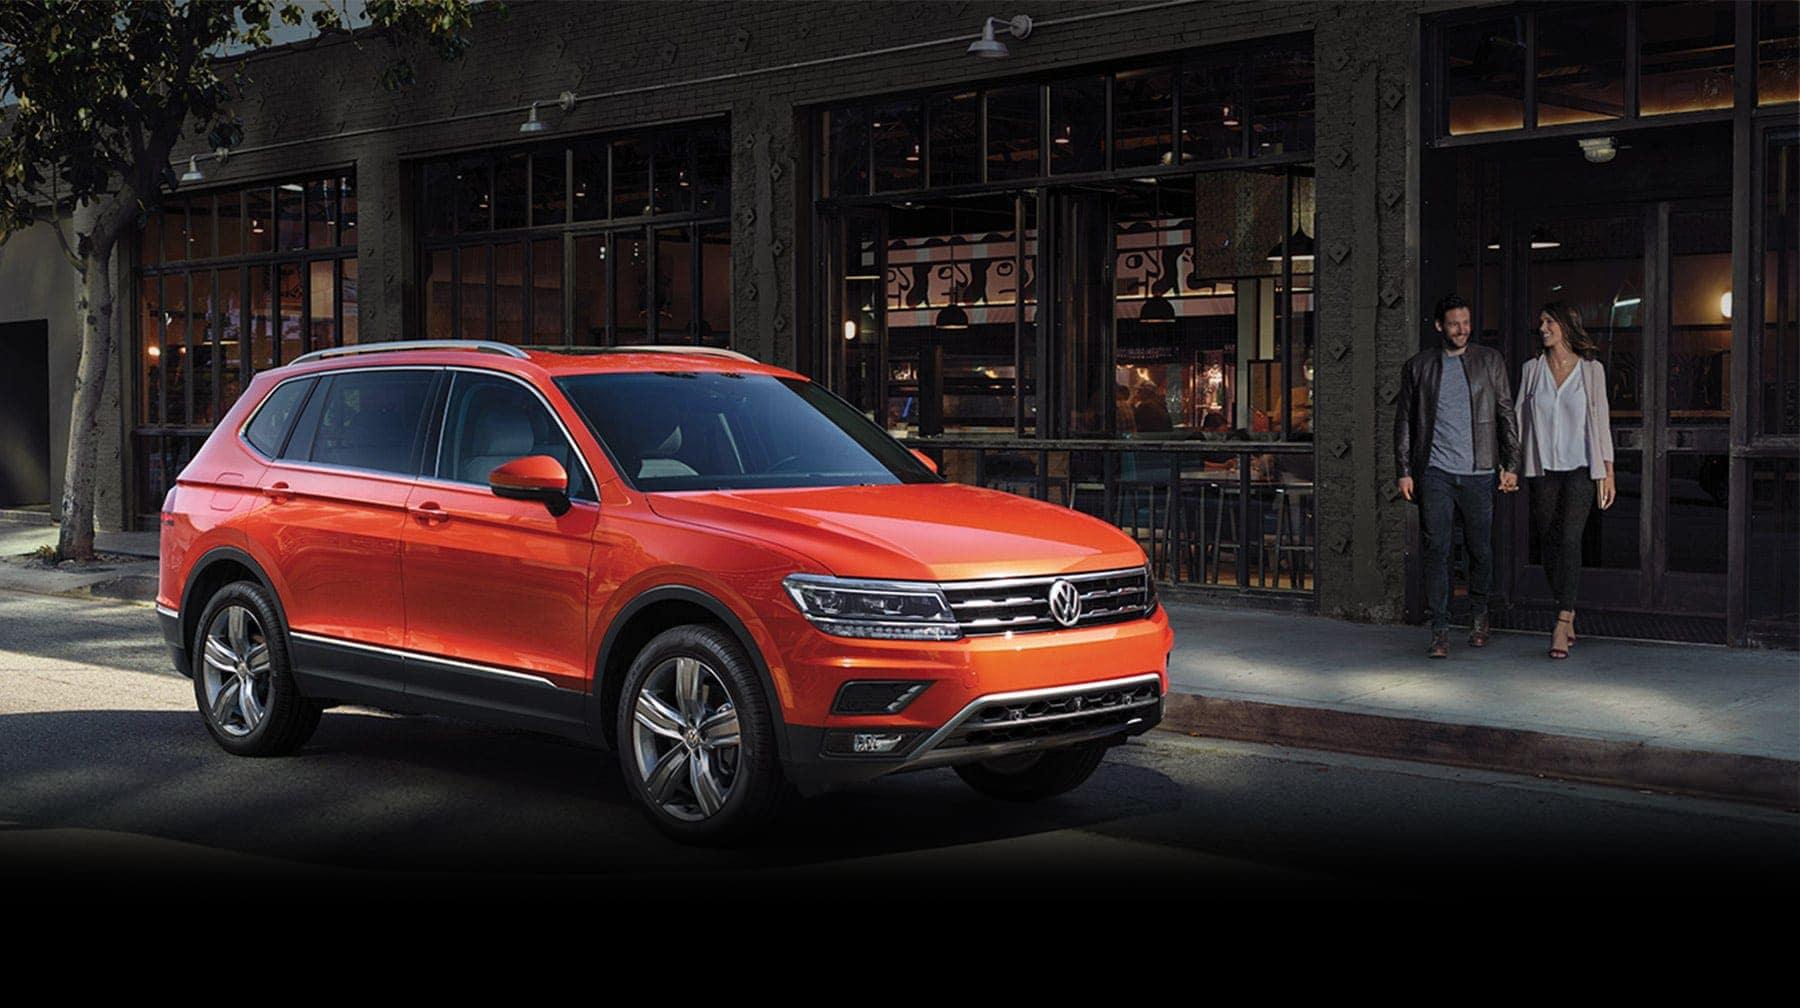 Autohaus Lancaster VW | Reading, Harrisburg & York, PA